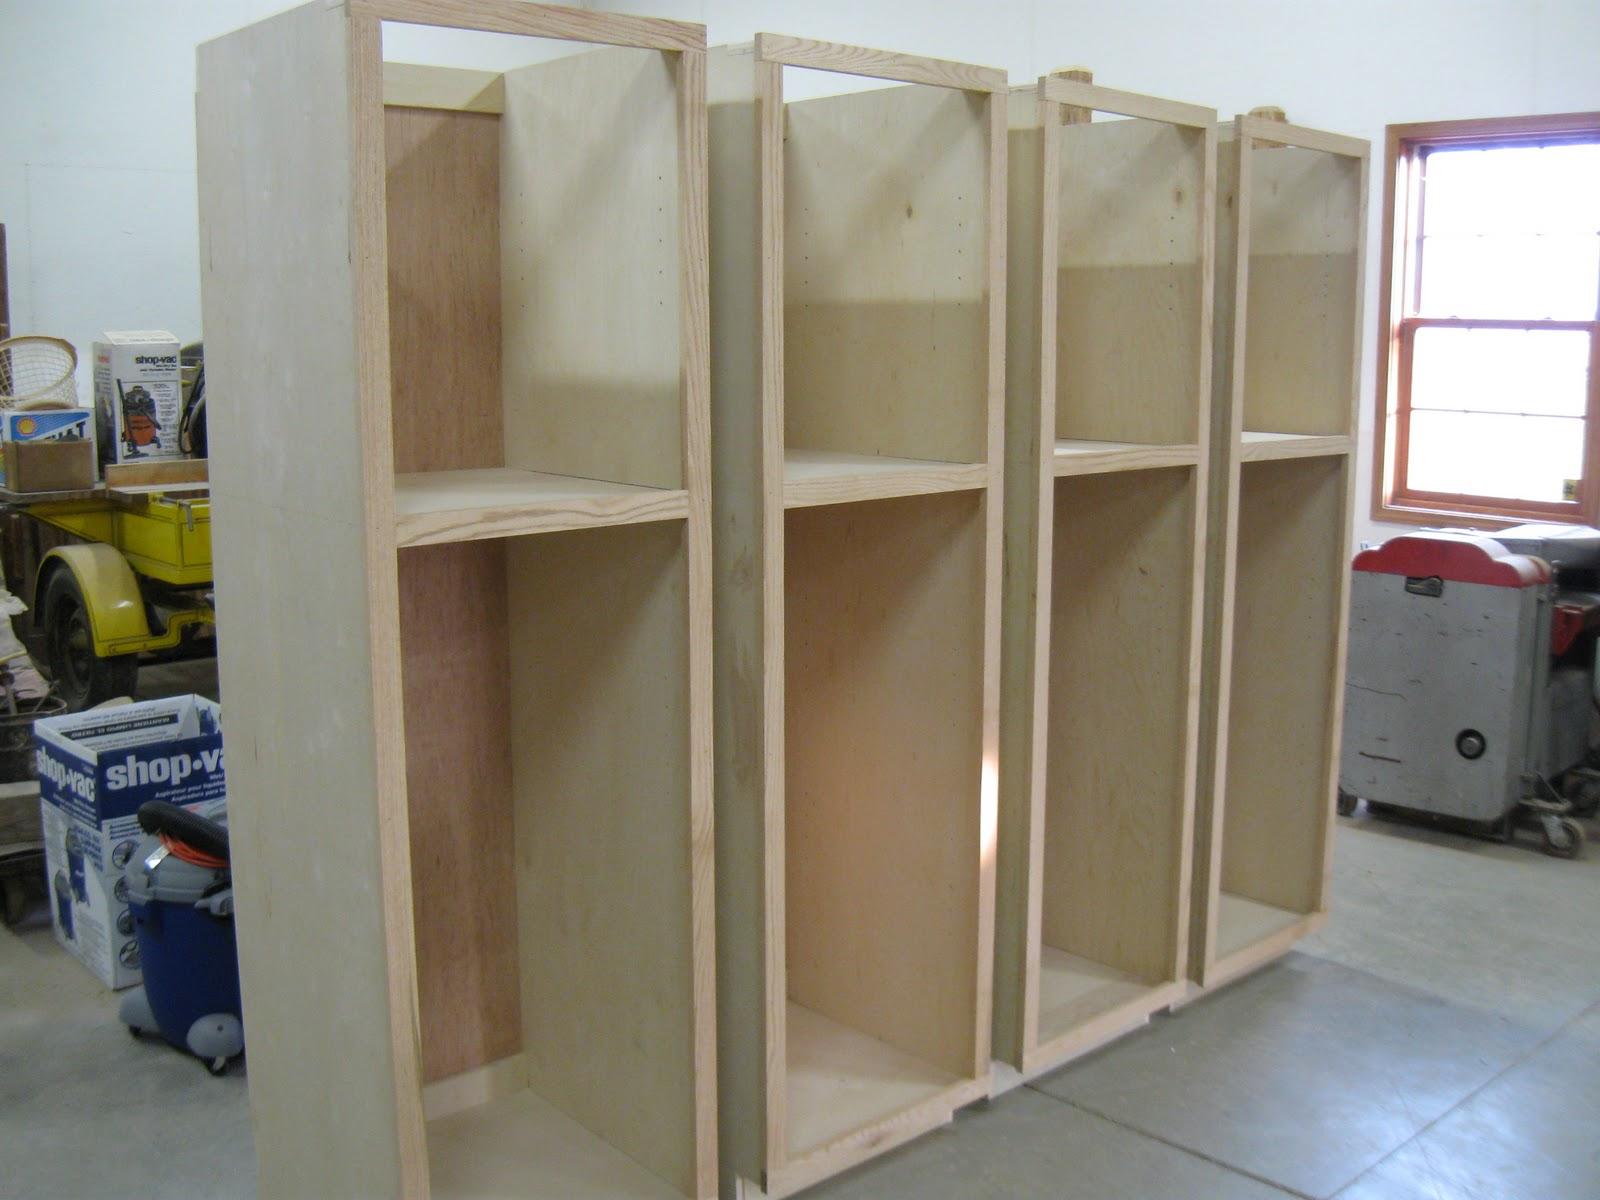 Eisenmann family woodworking - Simple garage storage cabinets in cool structured design ...